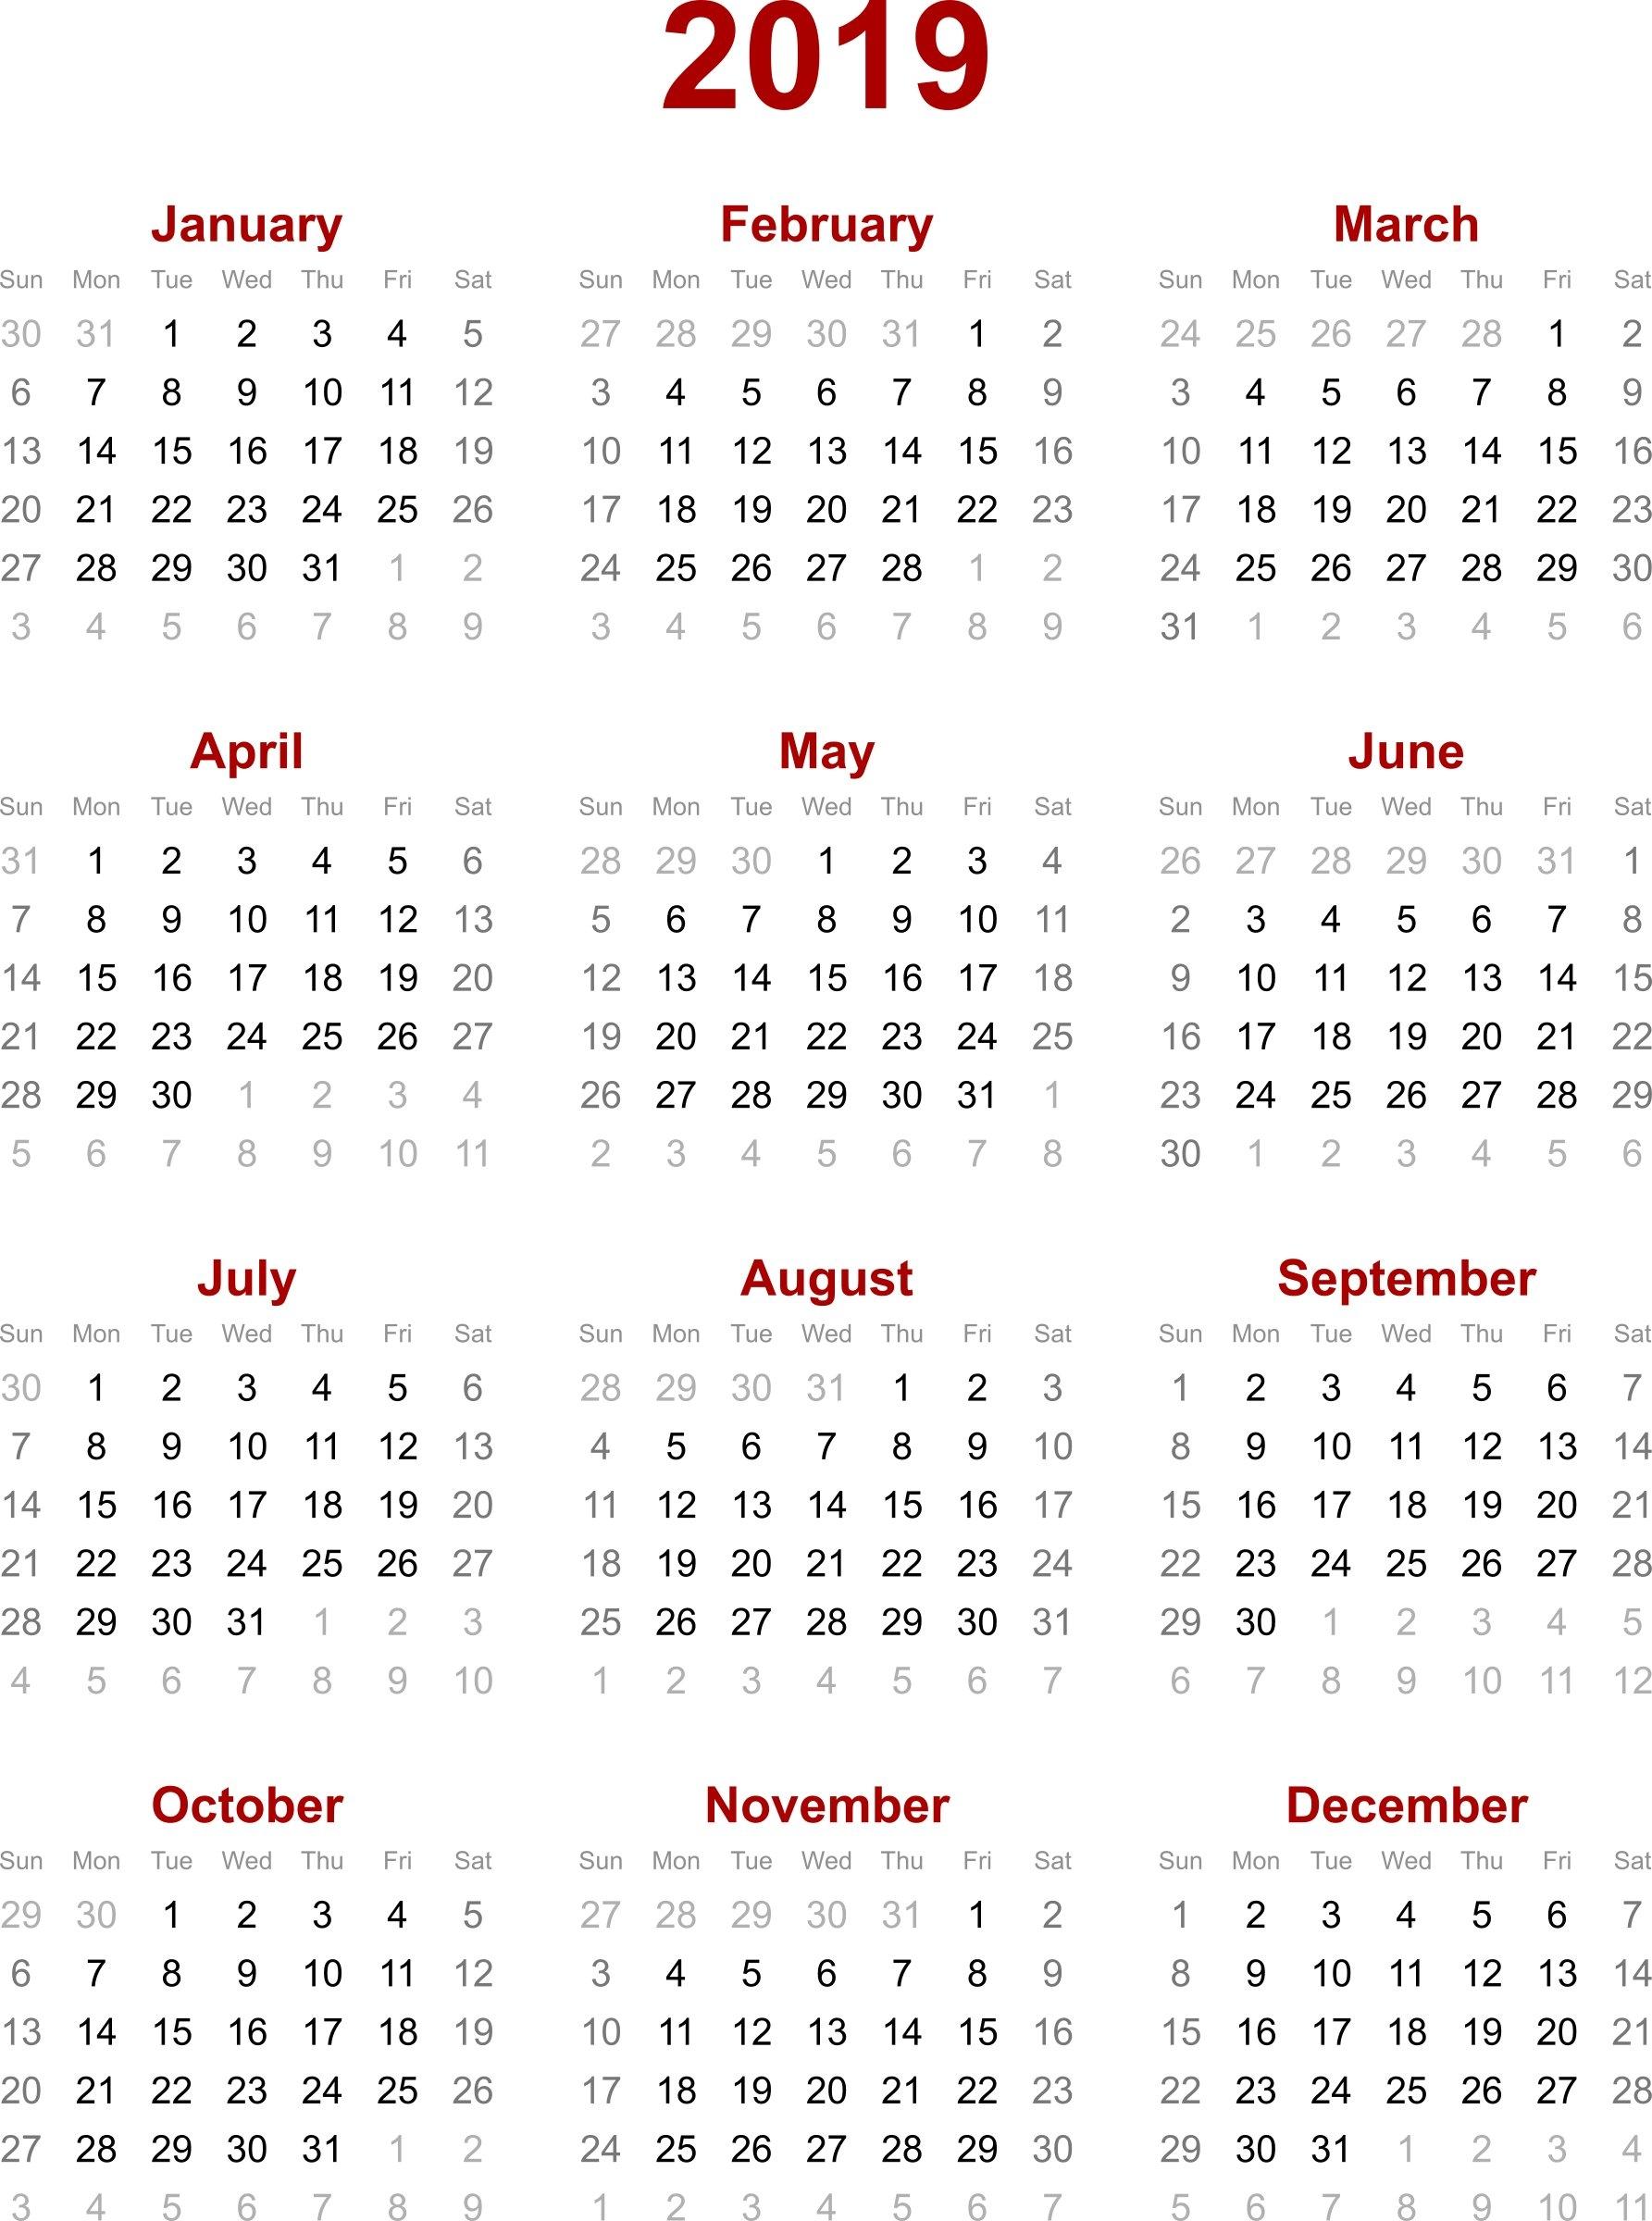 2019 Calendar Printable - Printable Calendar & Birthday Cards Calendar Of 2019